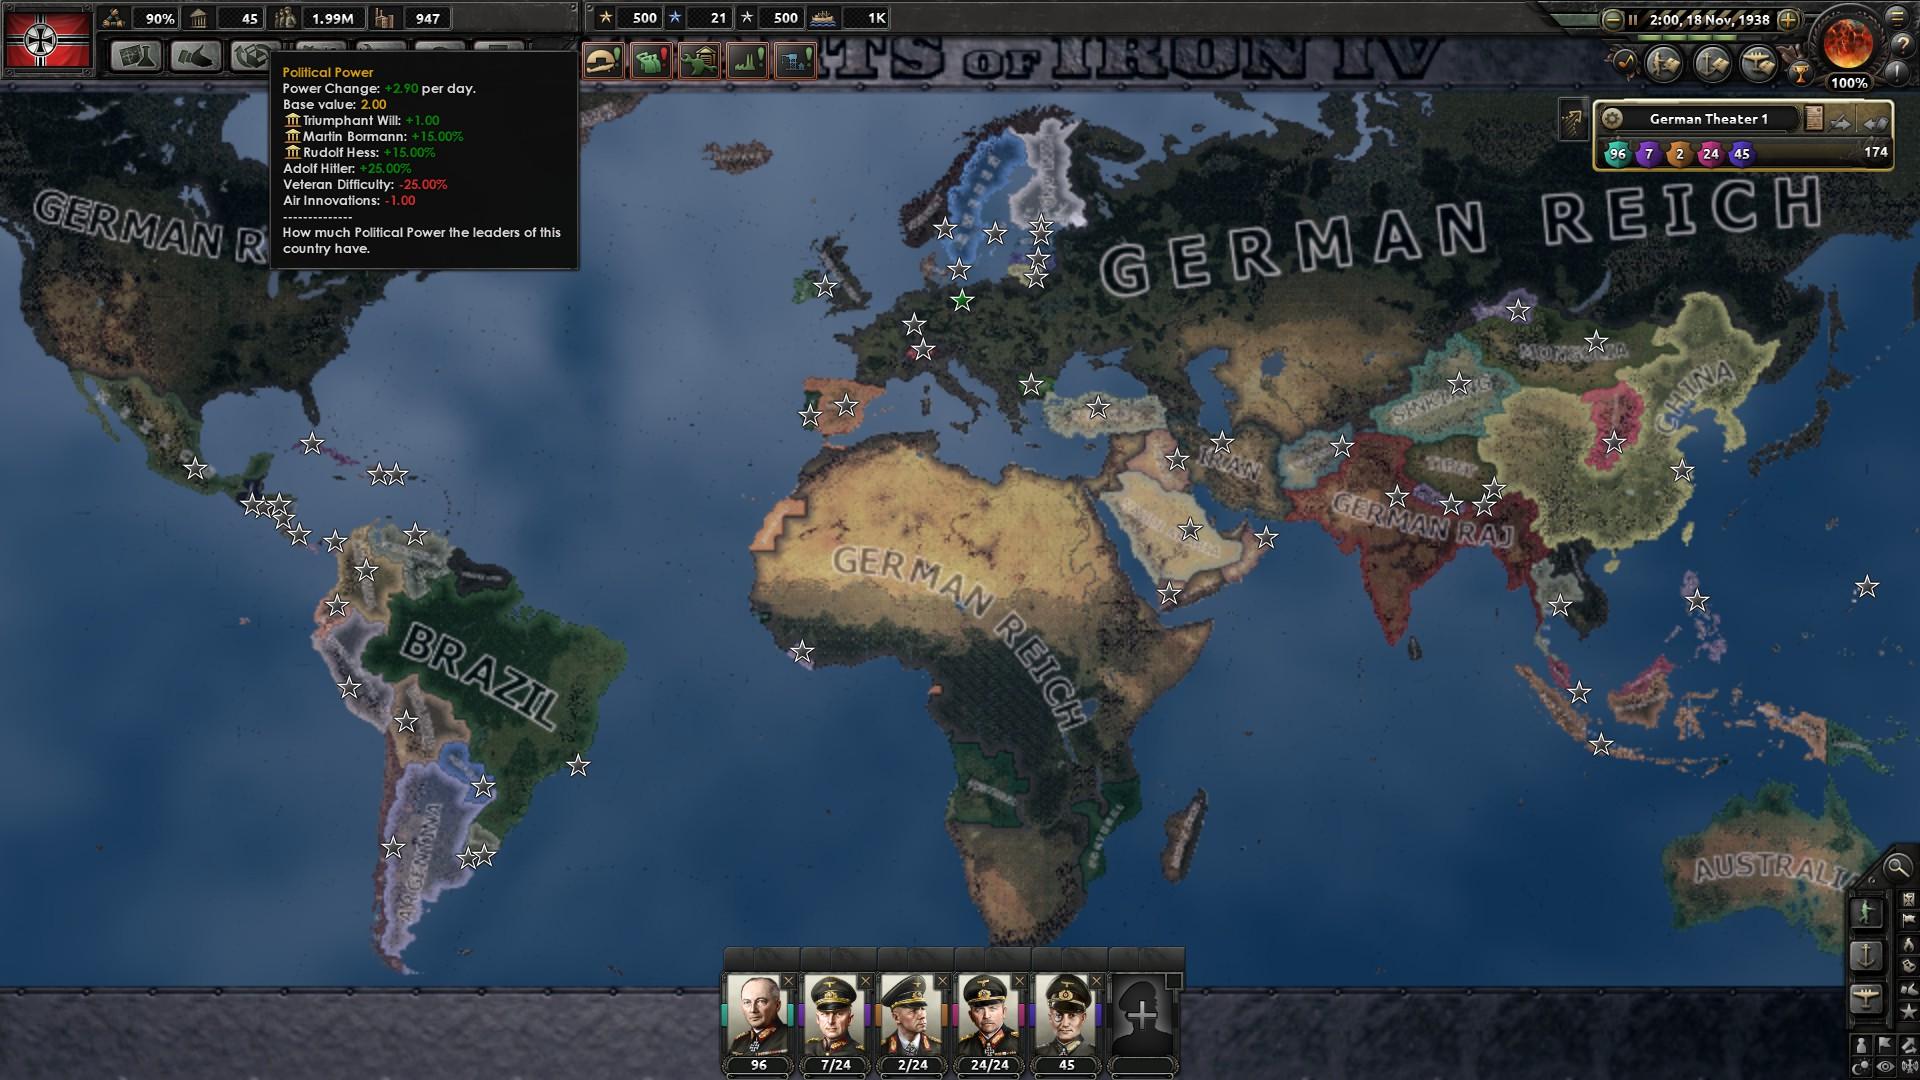 Fastest Blitzkrieg | Paradox Interactive Forums